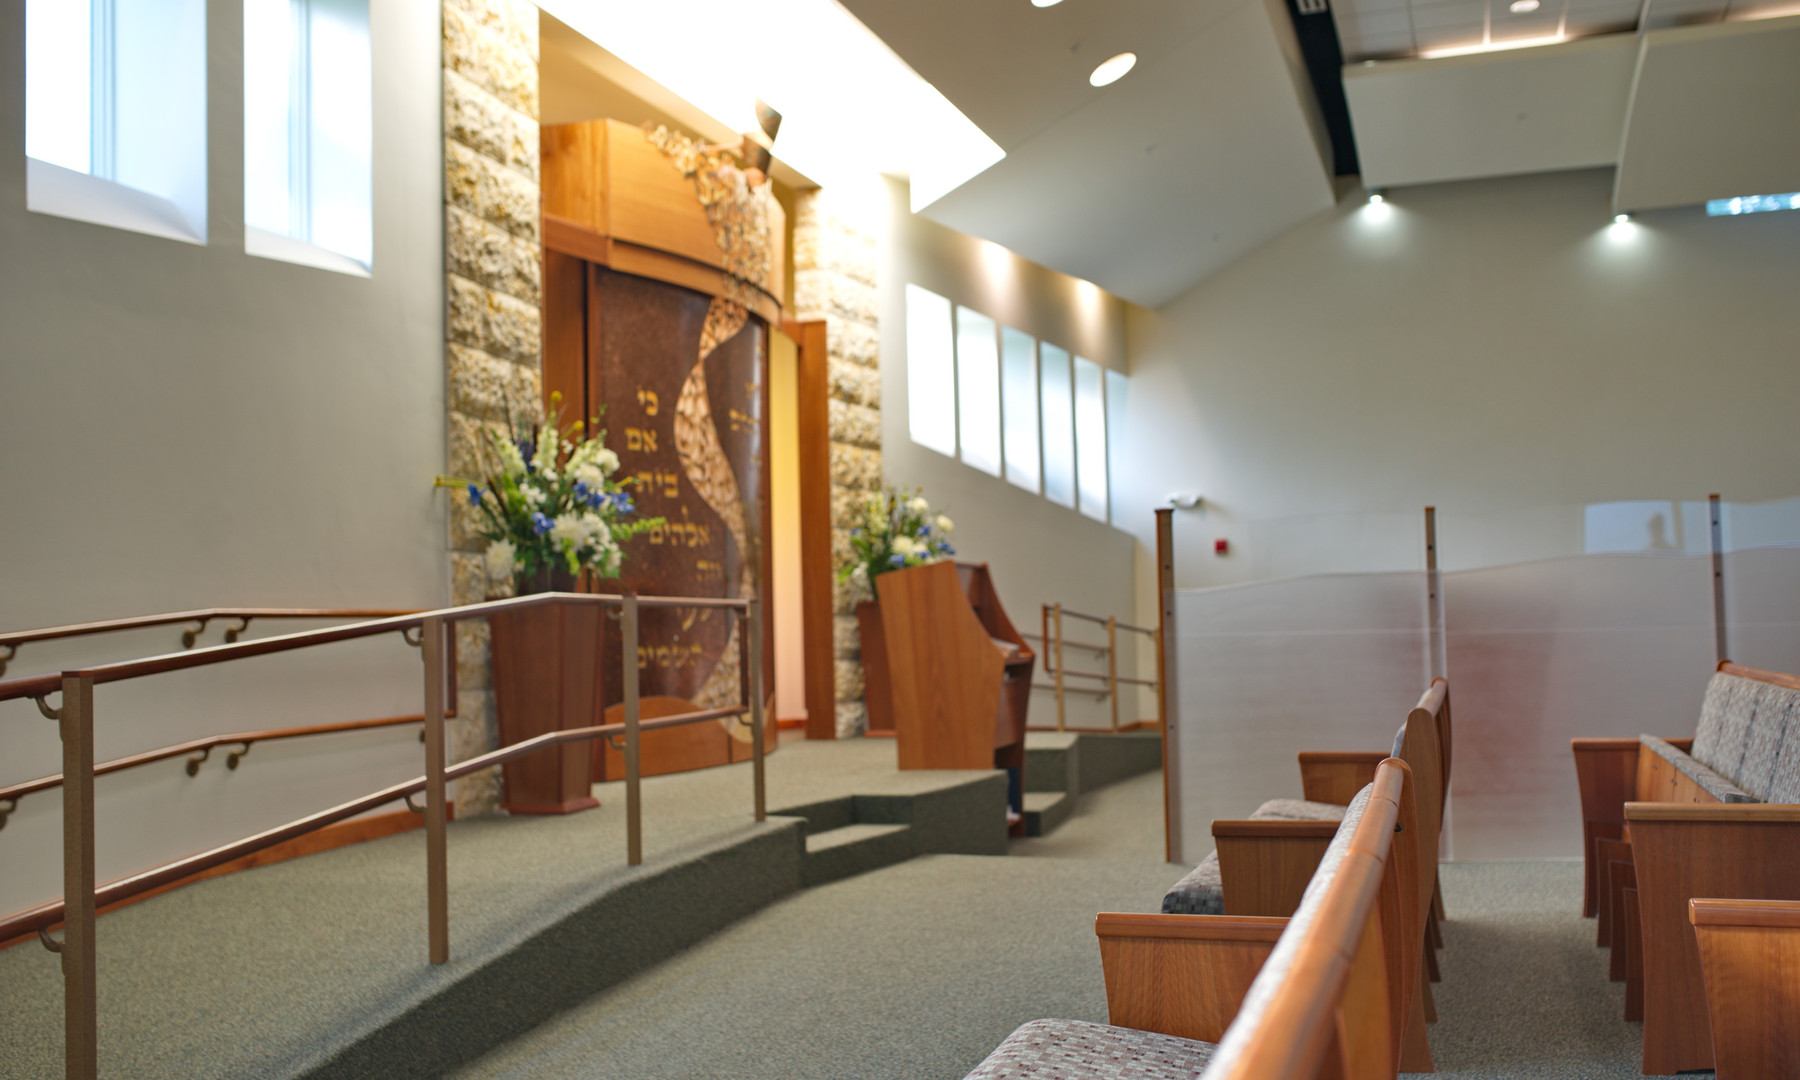 Congregation Shaarei Tefillah of Newton